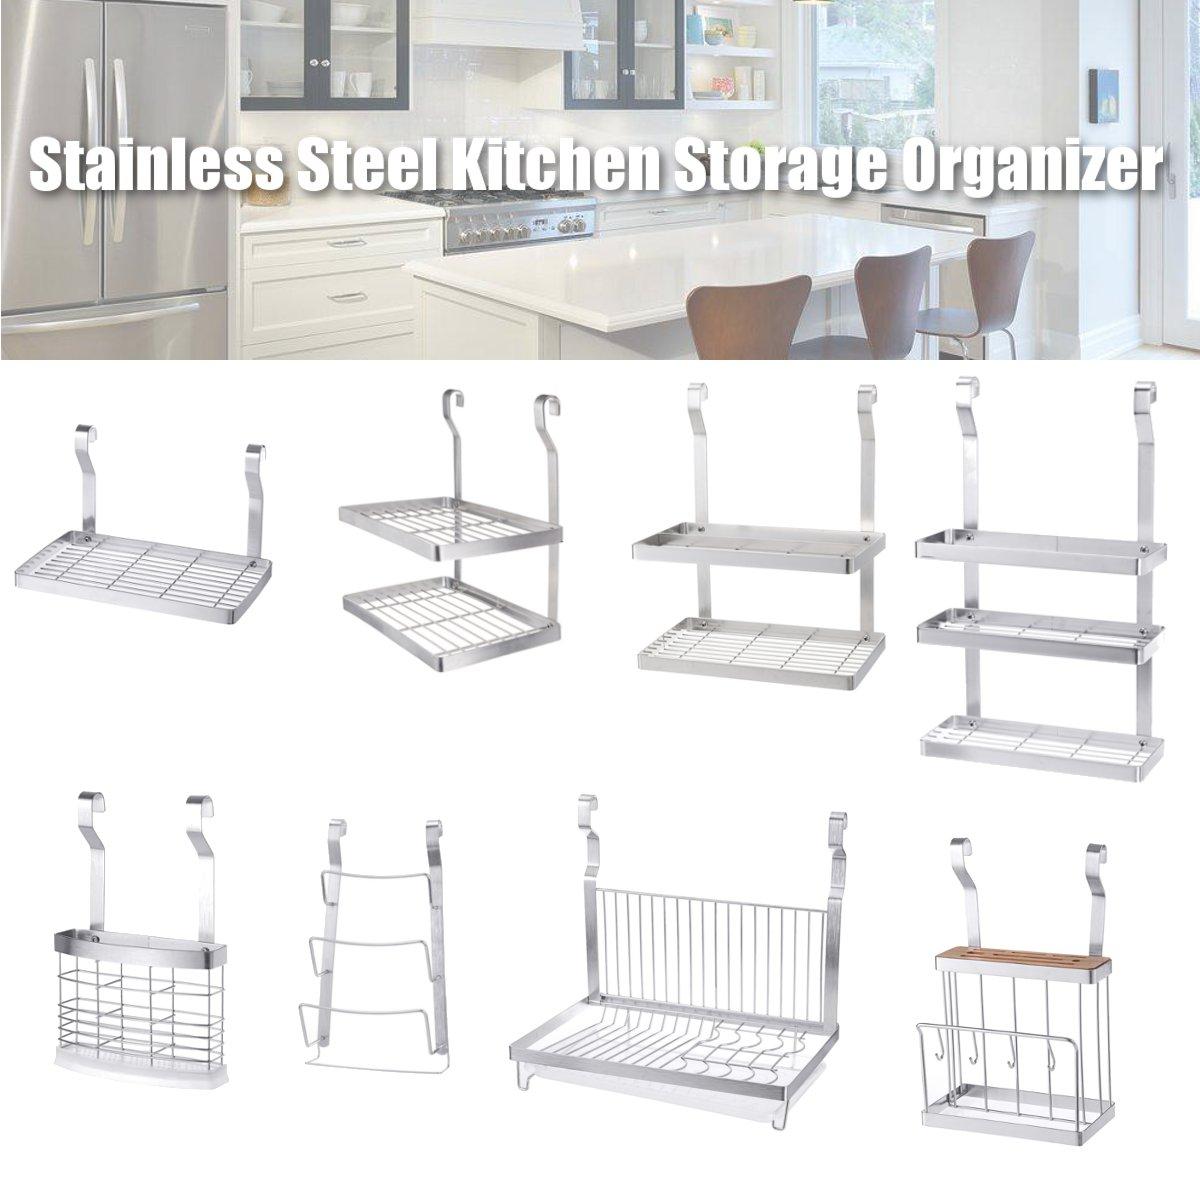 Stainless Steel Organizer Wall Hanging Dish Rack Storage Drying Holder Kitchen Ebay